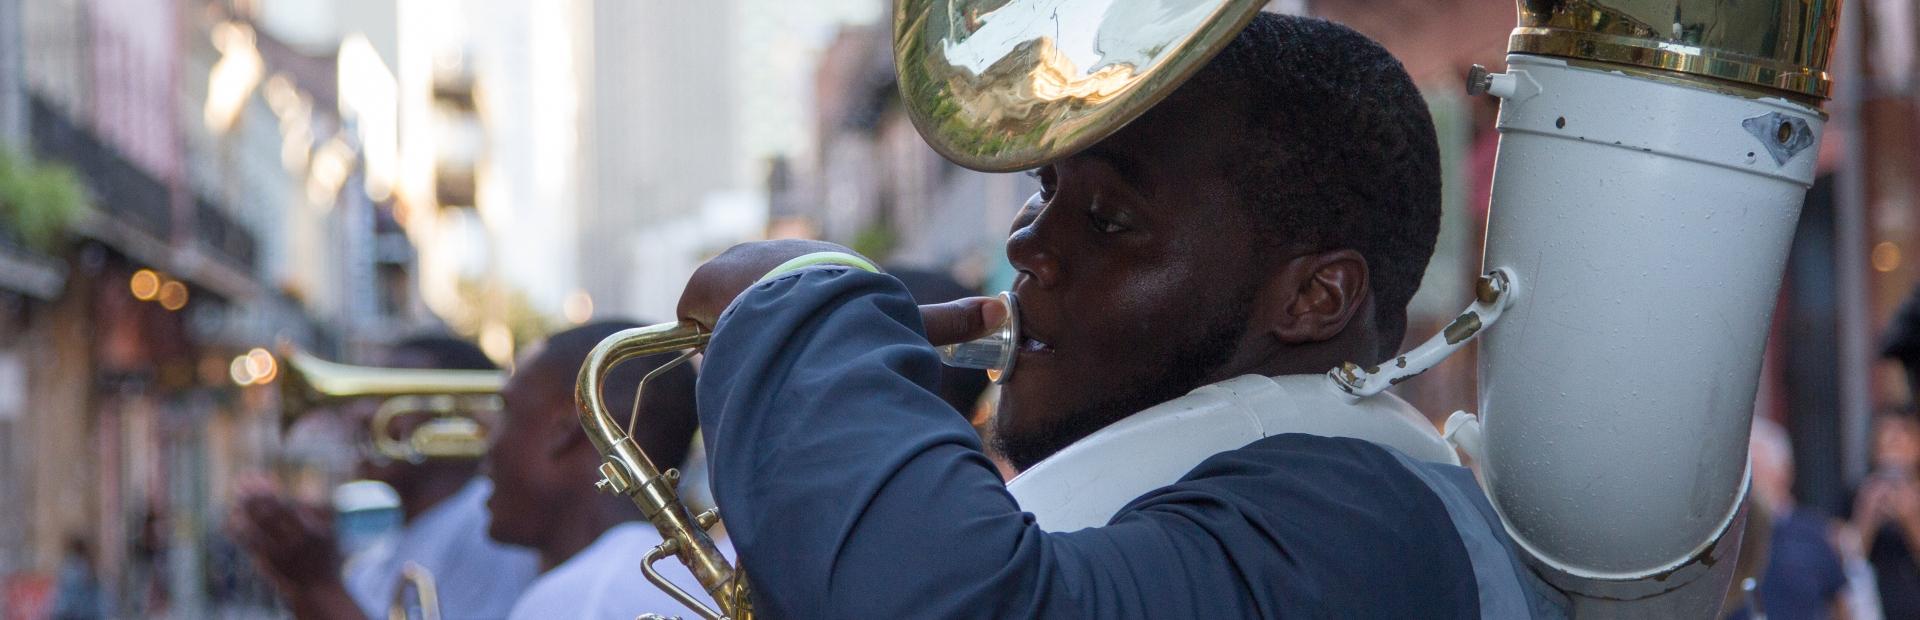 New Orleans-Amerika